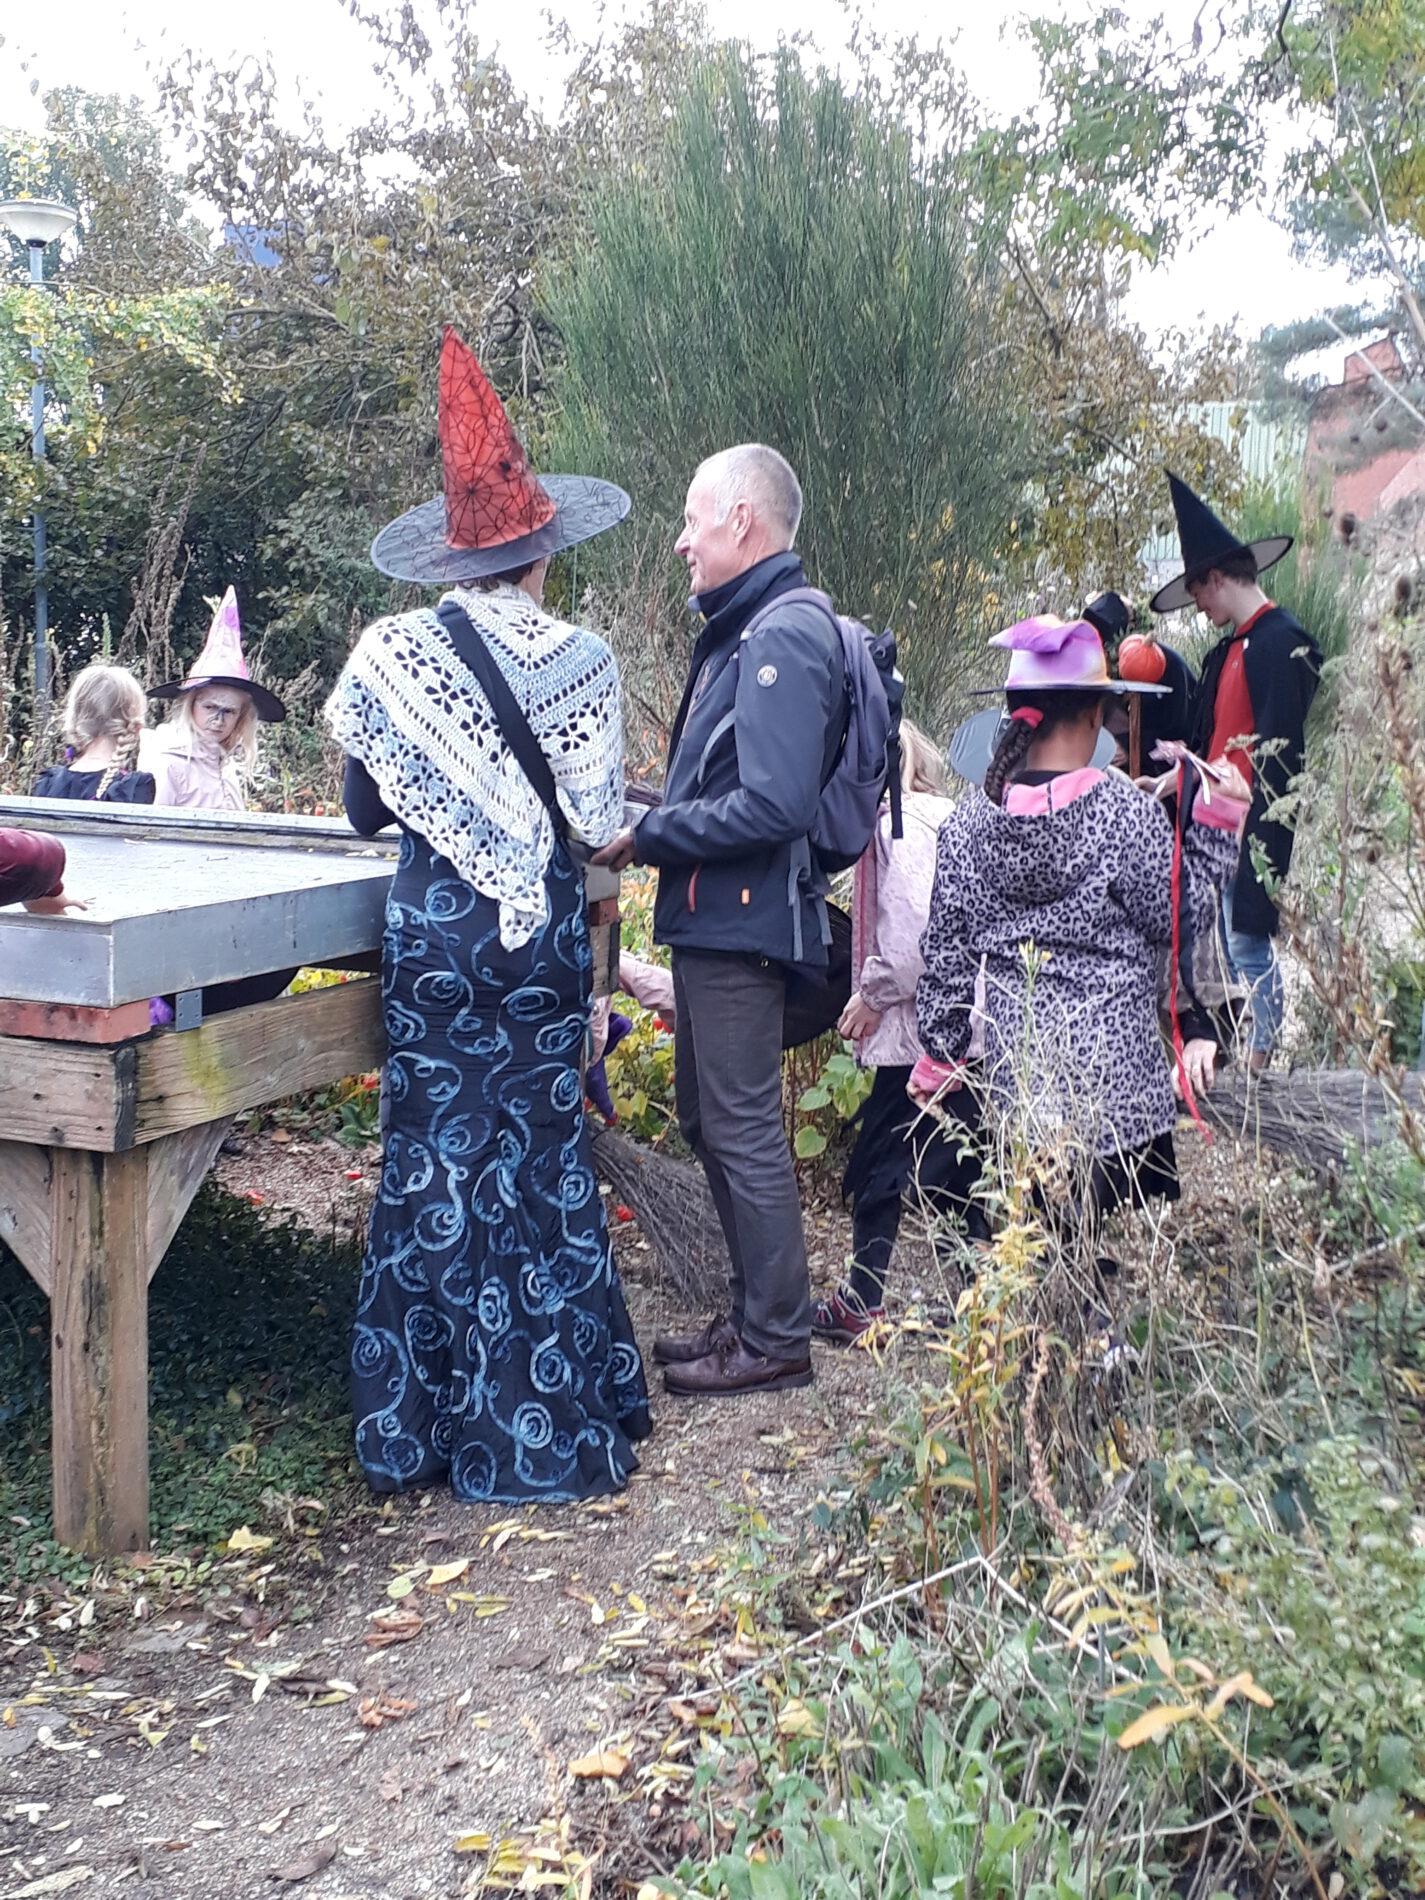 (VOL) Kinderrondleiding: ga je mee op heksentour?